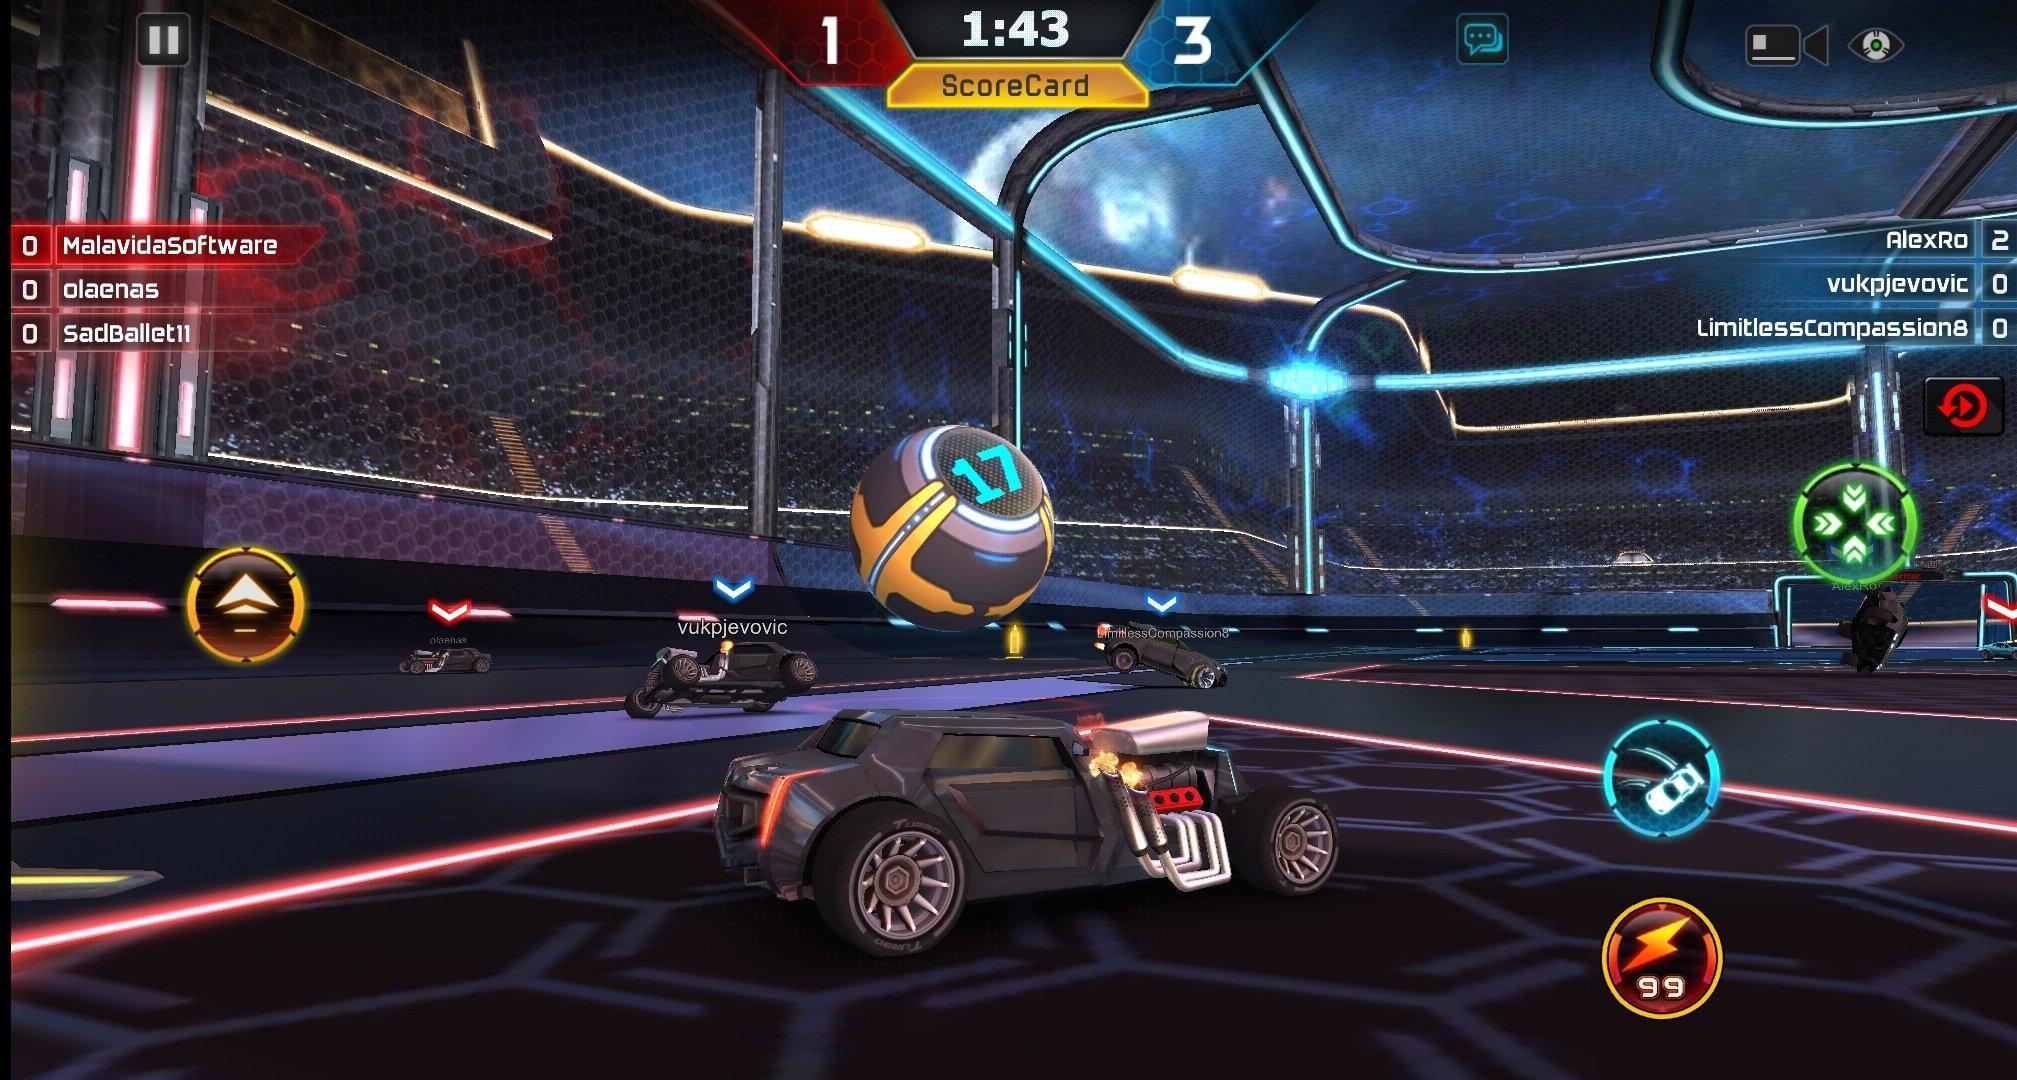 Turbo League 2.3 - Baixar para Android APK Grátis